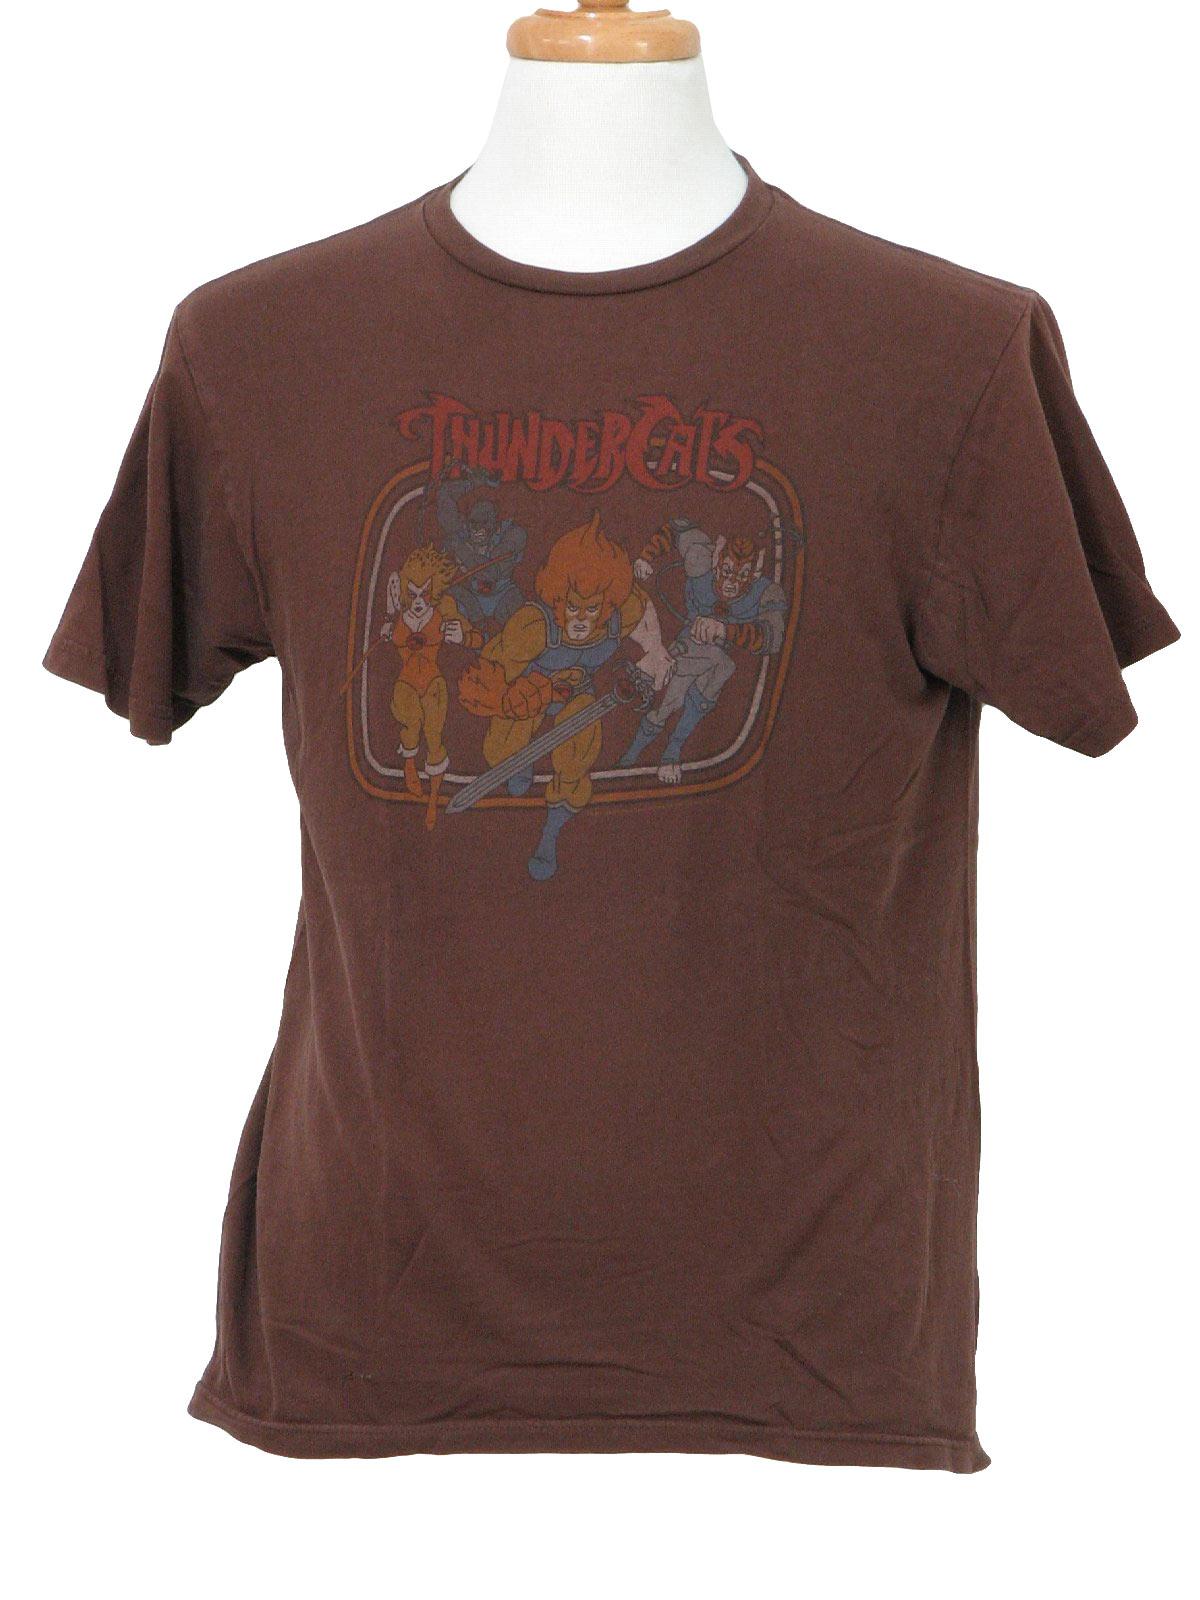 1980 39 s vintage bay island t shirt 80s bay island mens for South bay t shirt printing